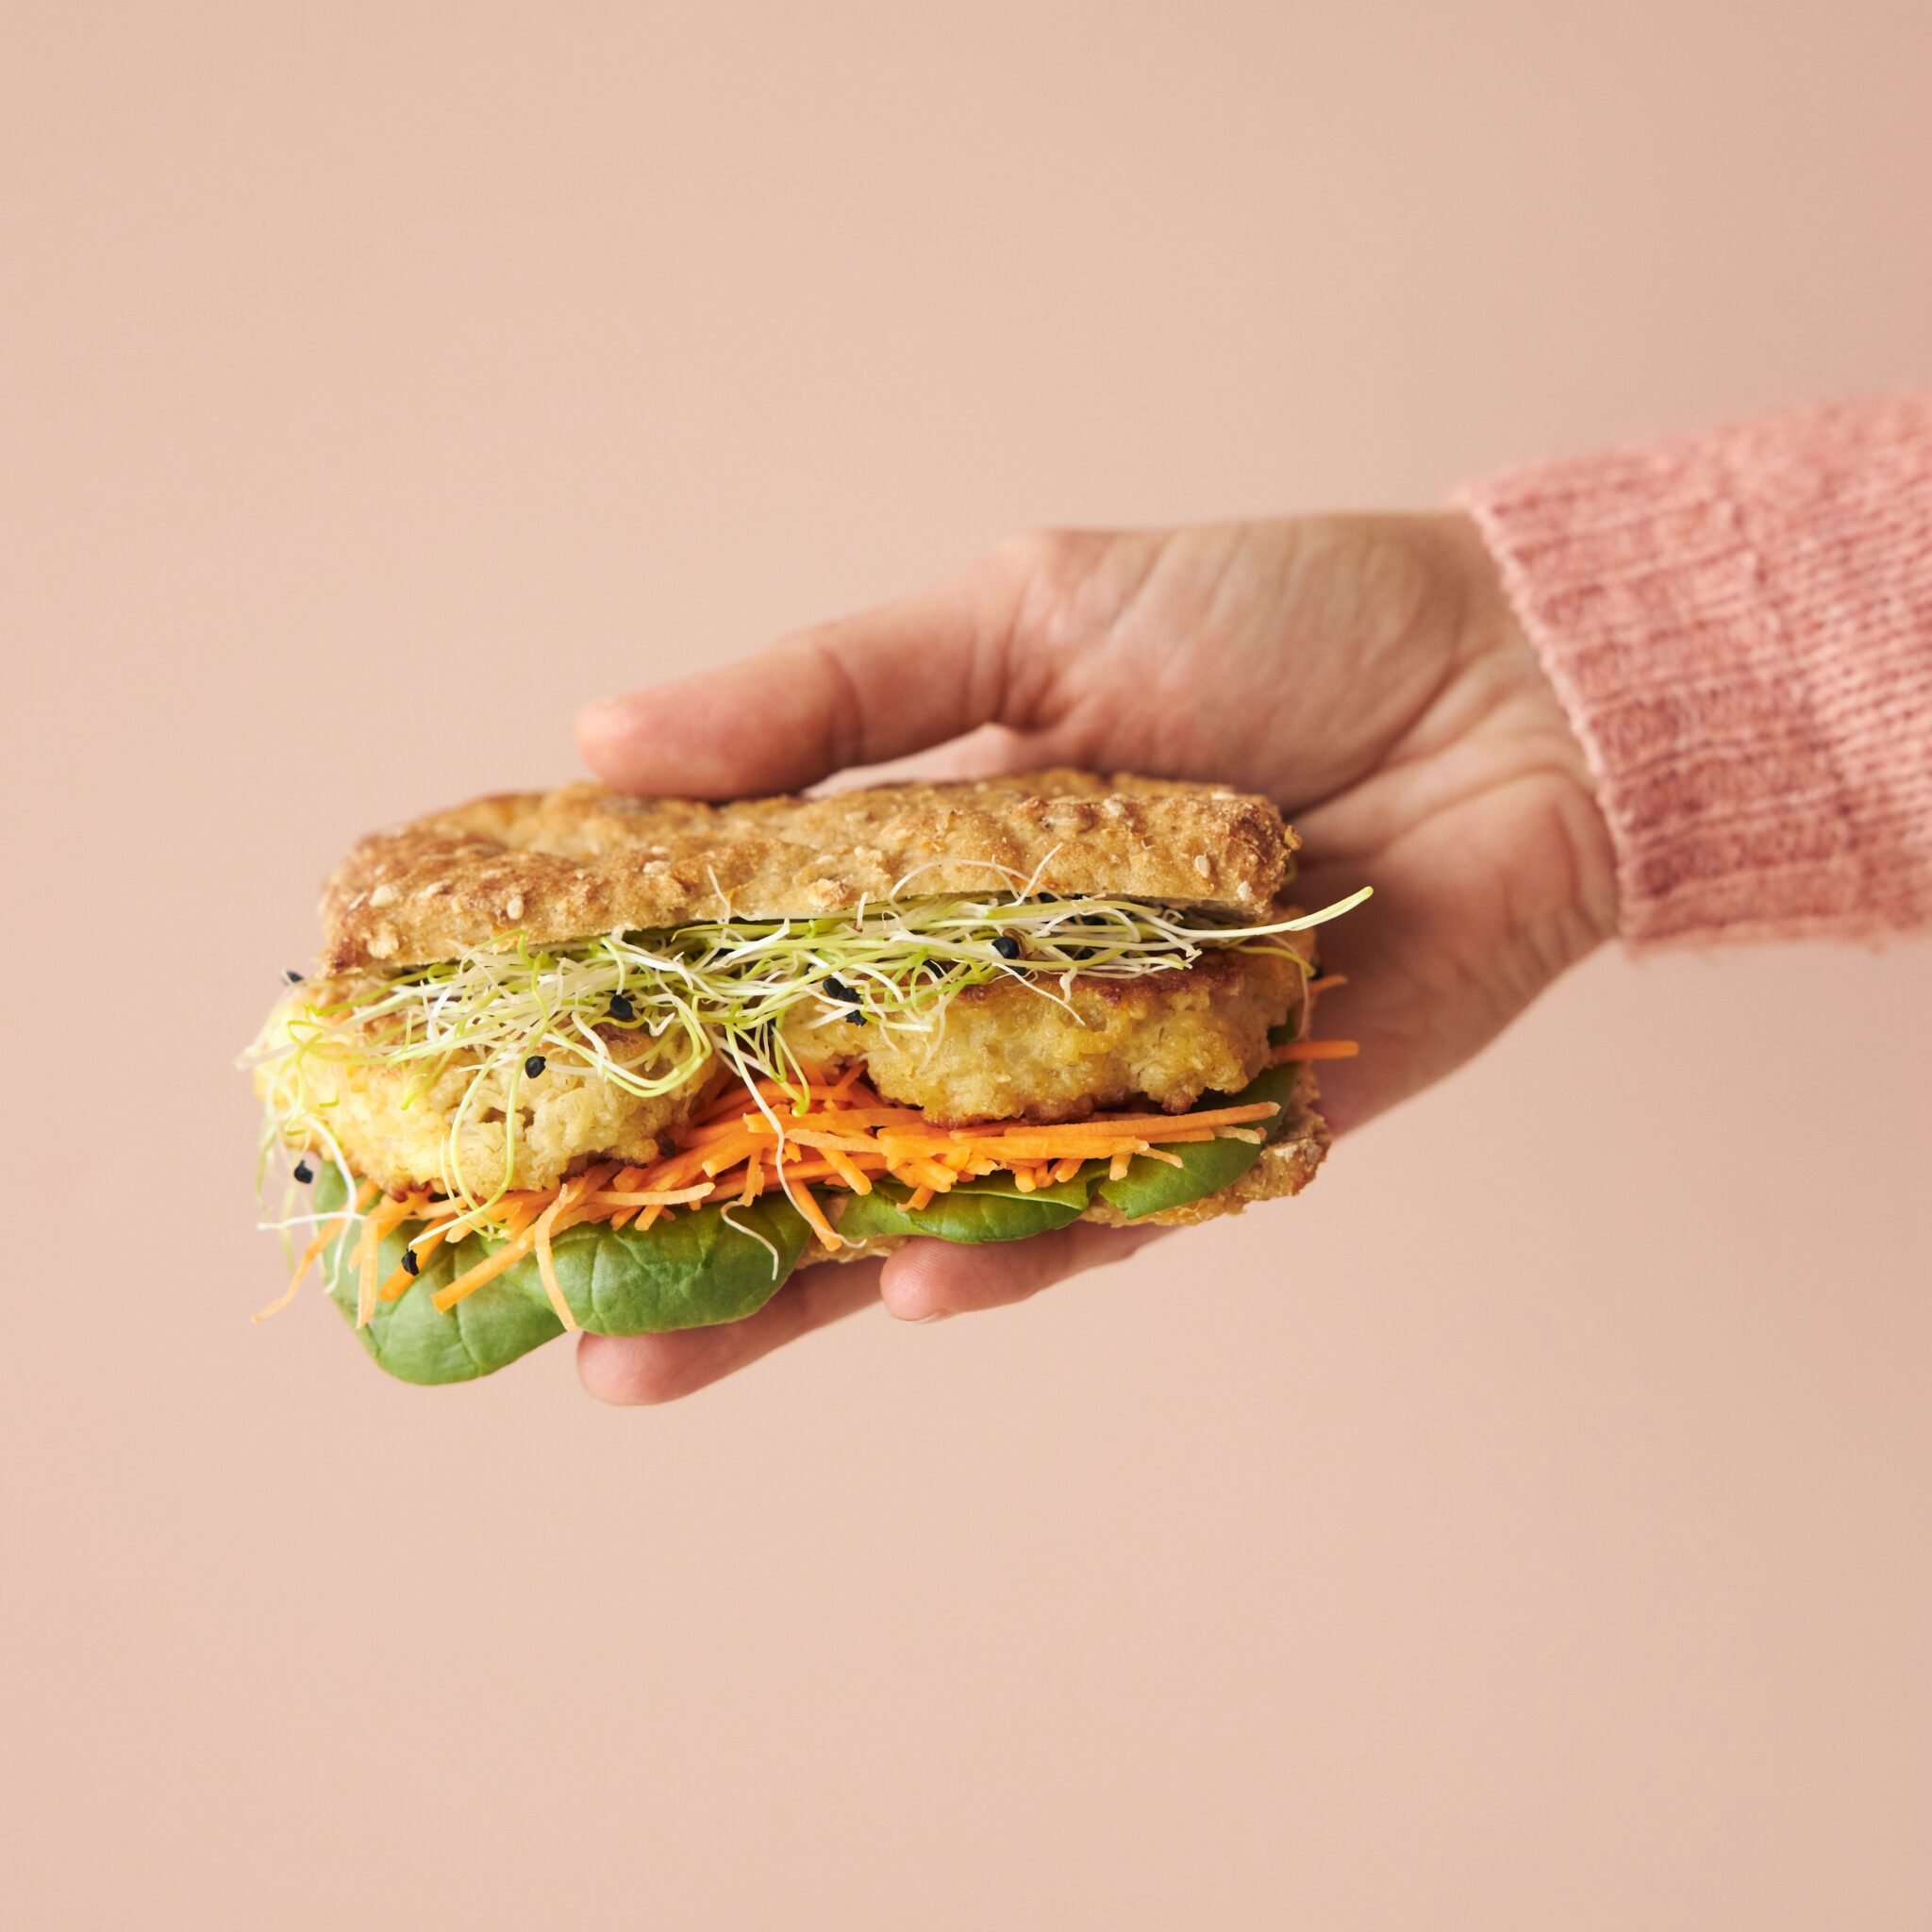 glutenfri sandwich med sæd kartoffel fra bogen Madpakker uden gluten